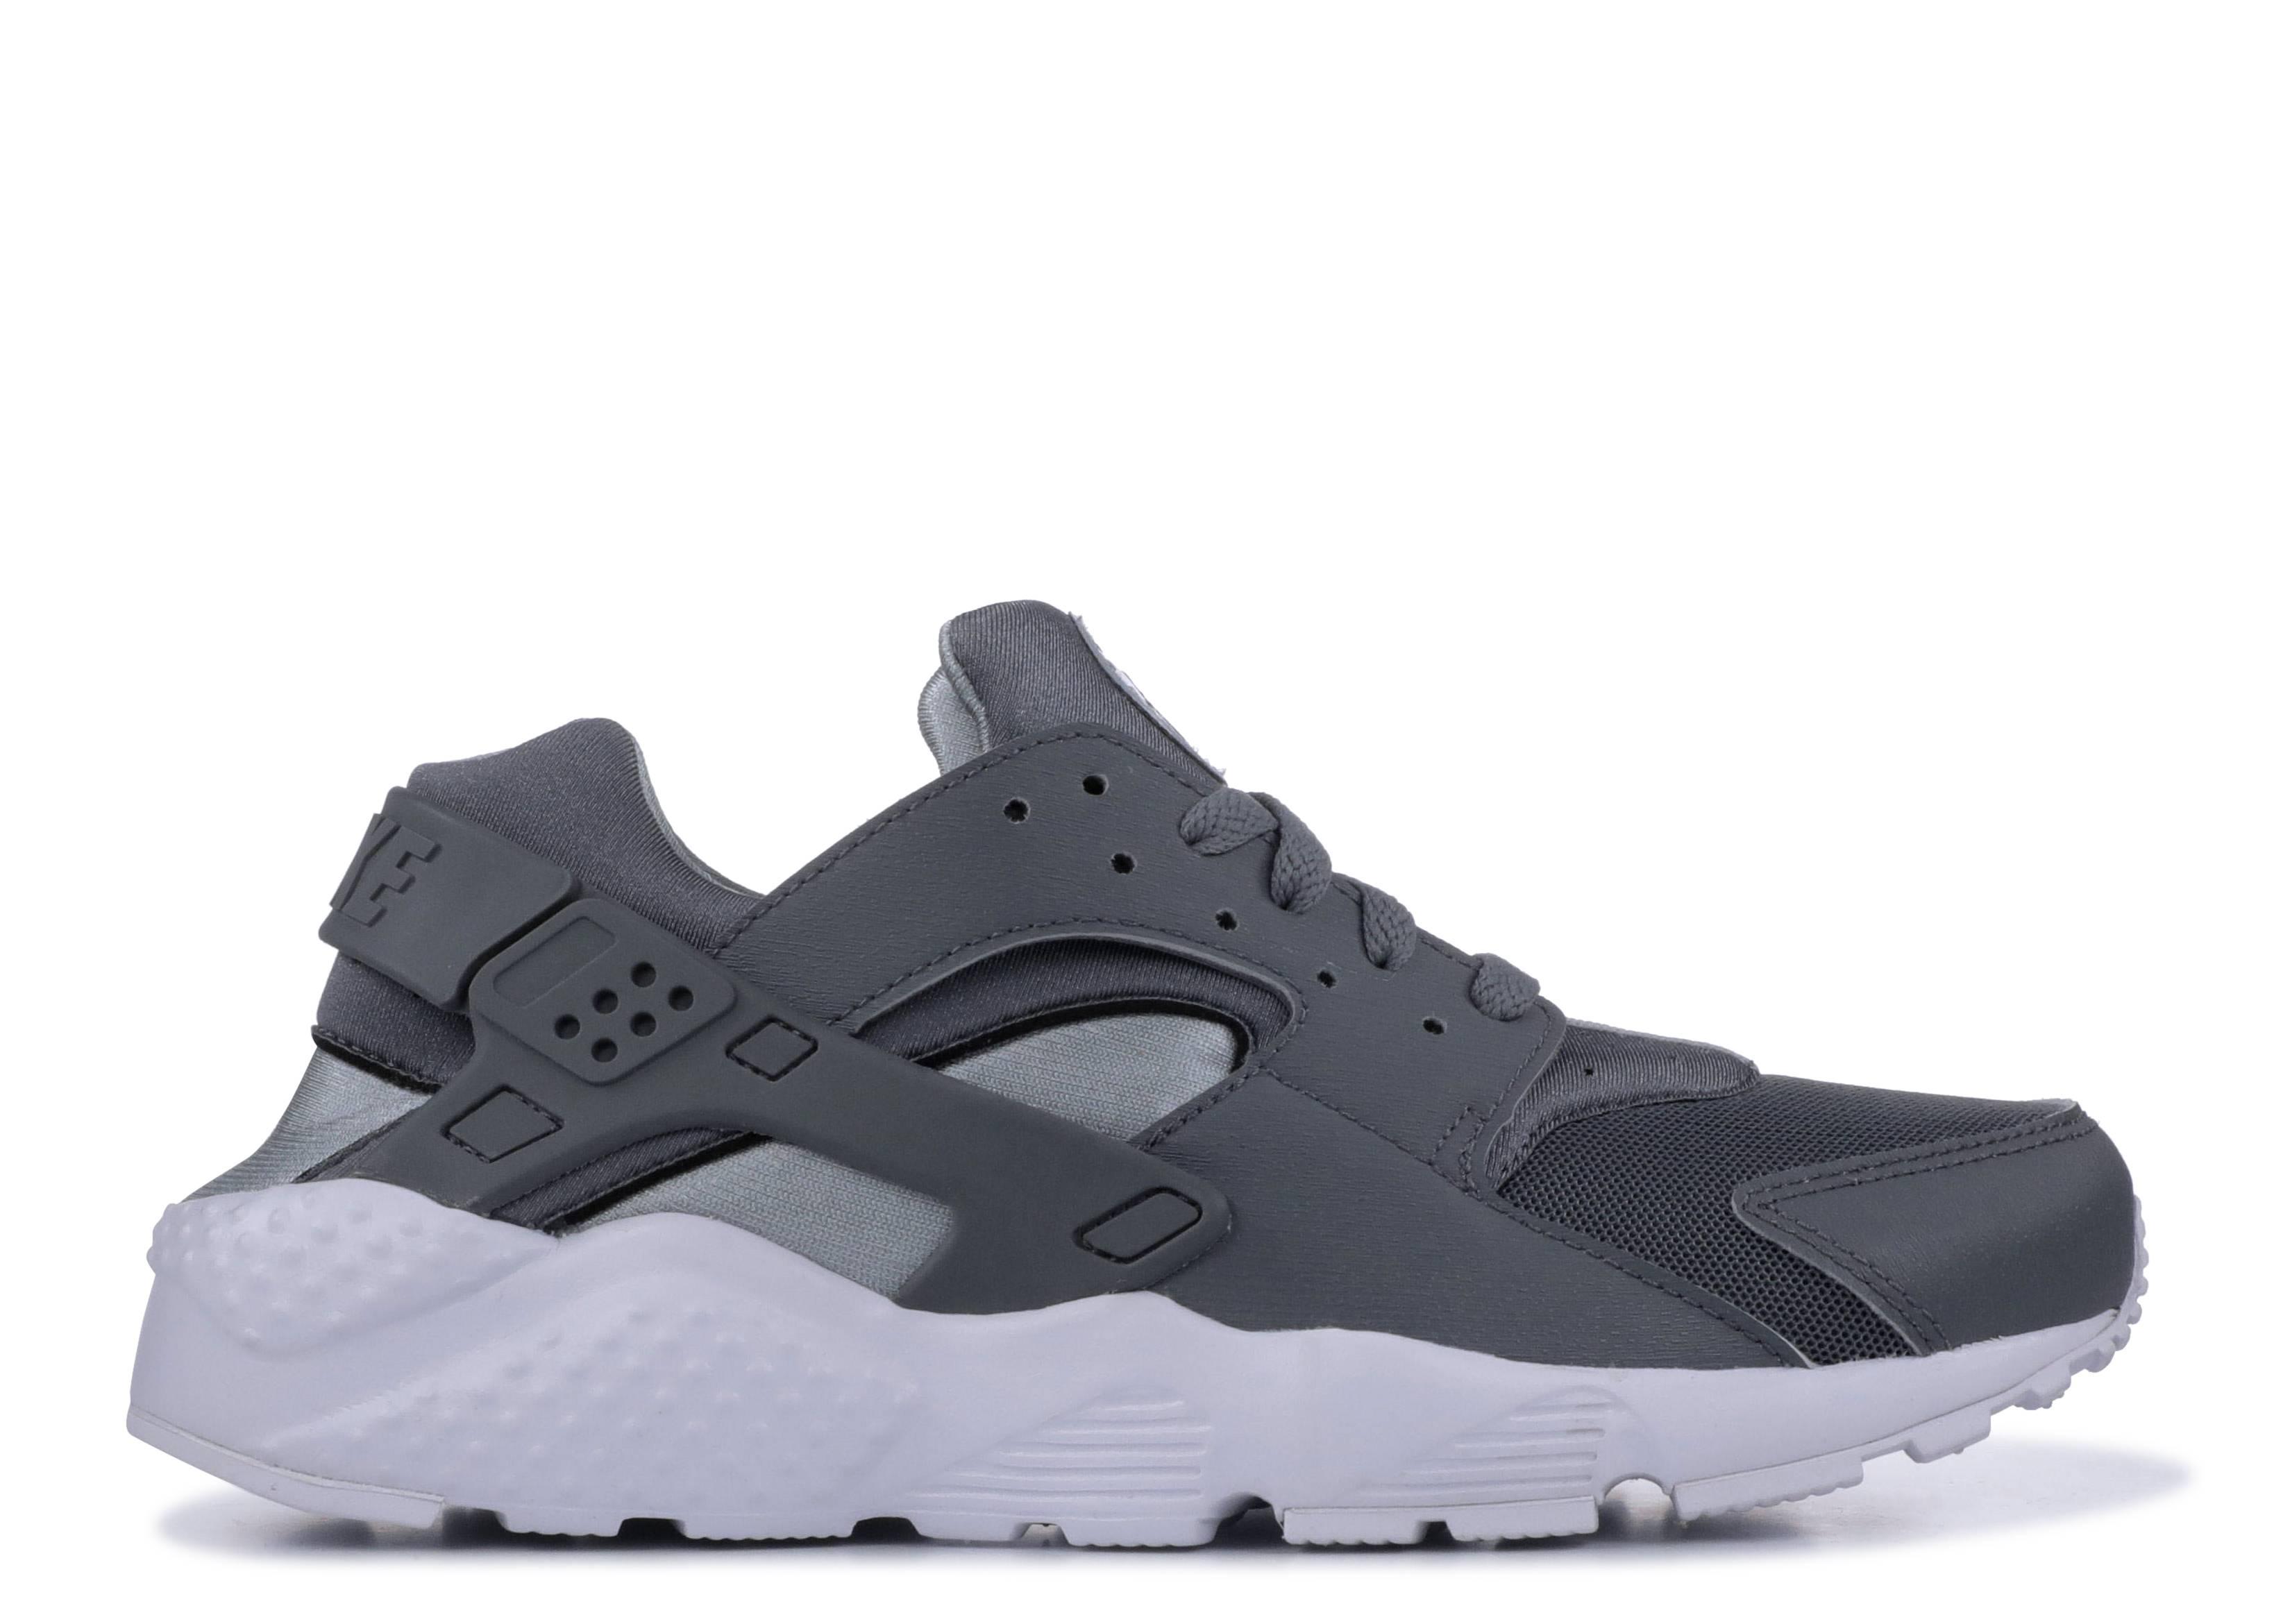 c74d7267c03d4c Nike Huarache Run Gs - Nike - 654275 012 - cool grey   white ...